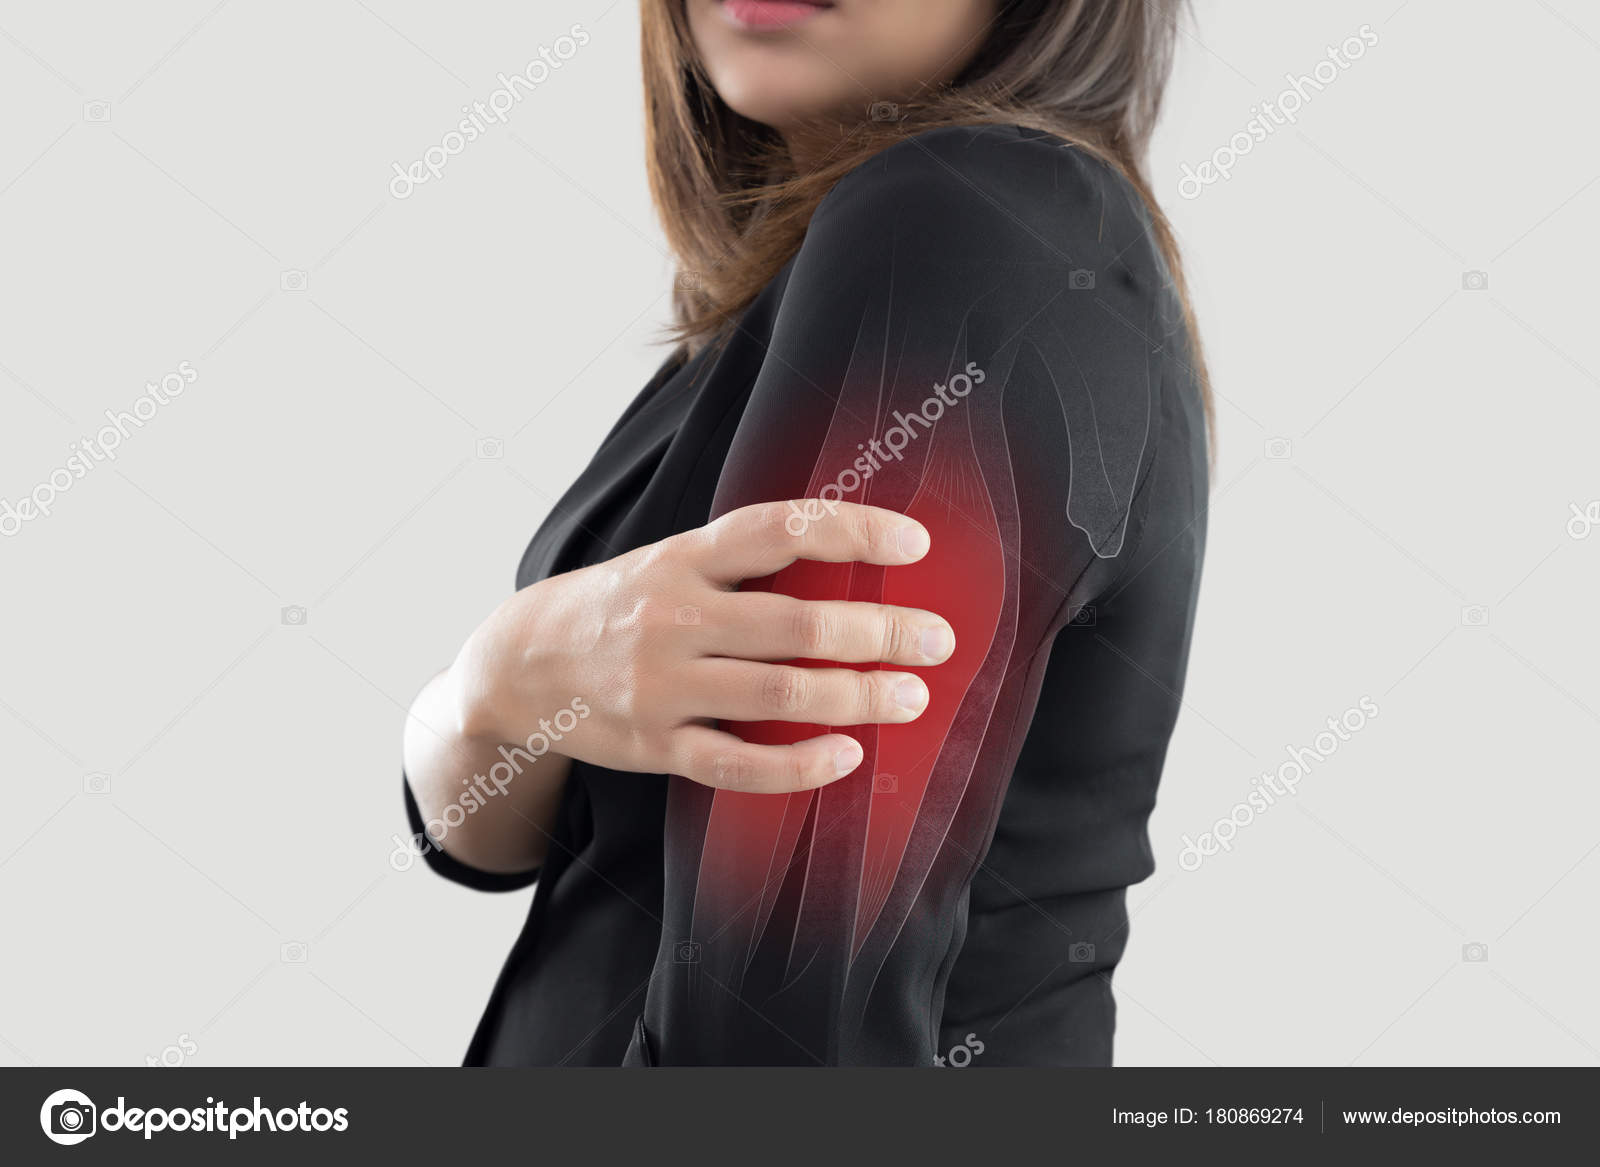 Frau mit Oberarm Schmerzen — Stockfoto © Tharakorn #180869274